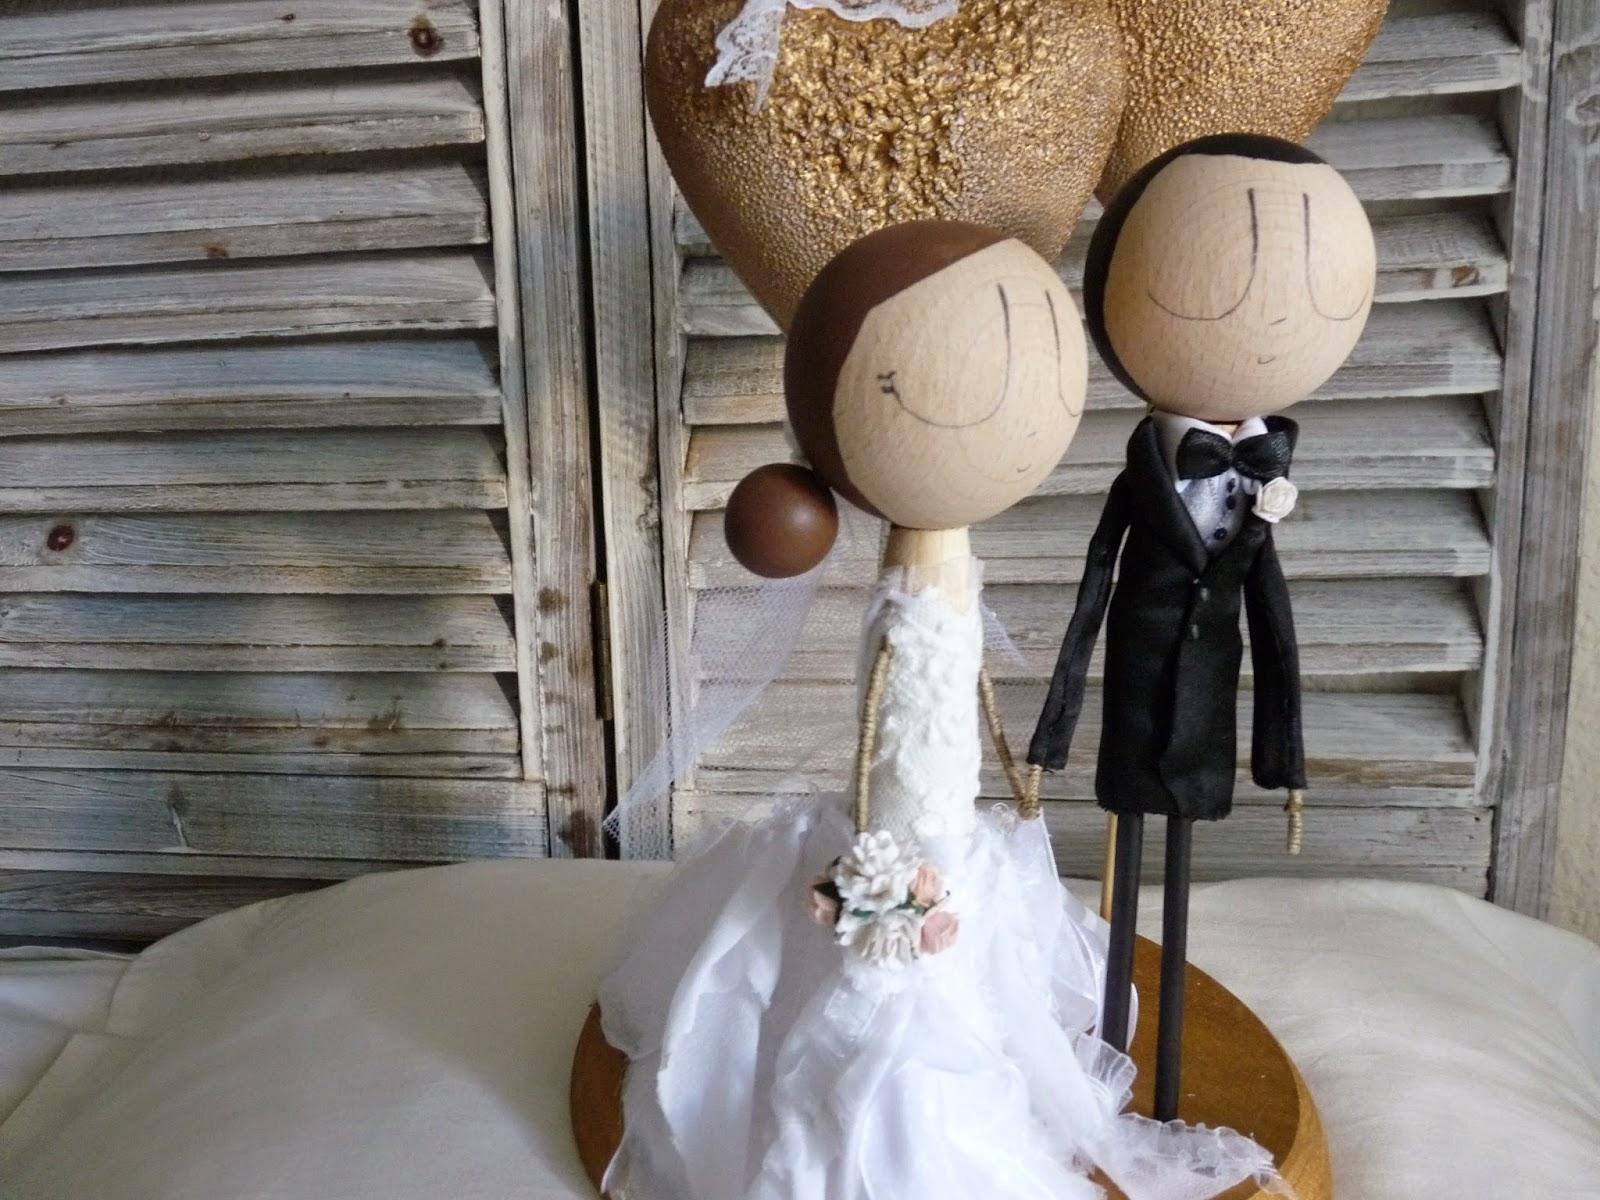 pronovias, novios pastel personalizados, figuras tarta, muñecos pastel, novios, novios originales, novios con encanto, wedding cake, topper cake, cake topper, bride,novia, novio, vestido novia, muñecos pastel personalizados, tarta boda, pastel nupcial, prometidos, nos casamos, novios de pastel elegante, con encanto, maleta, viaje de novios, ramo de novia, peinado novia, corbata novio, restaurante bodas, mrymrsbyani, mr&mrsbyani, wedding topper cake, frank sarabian